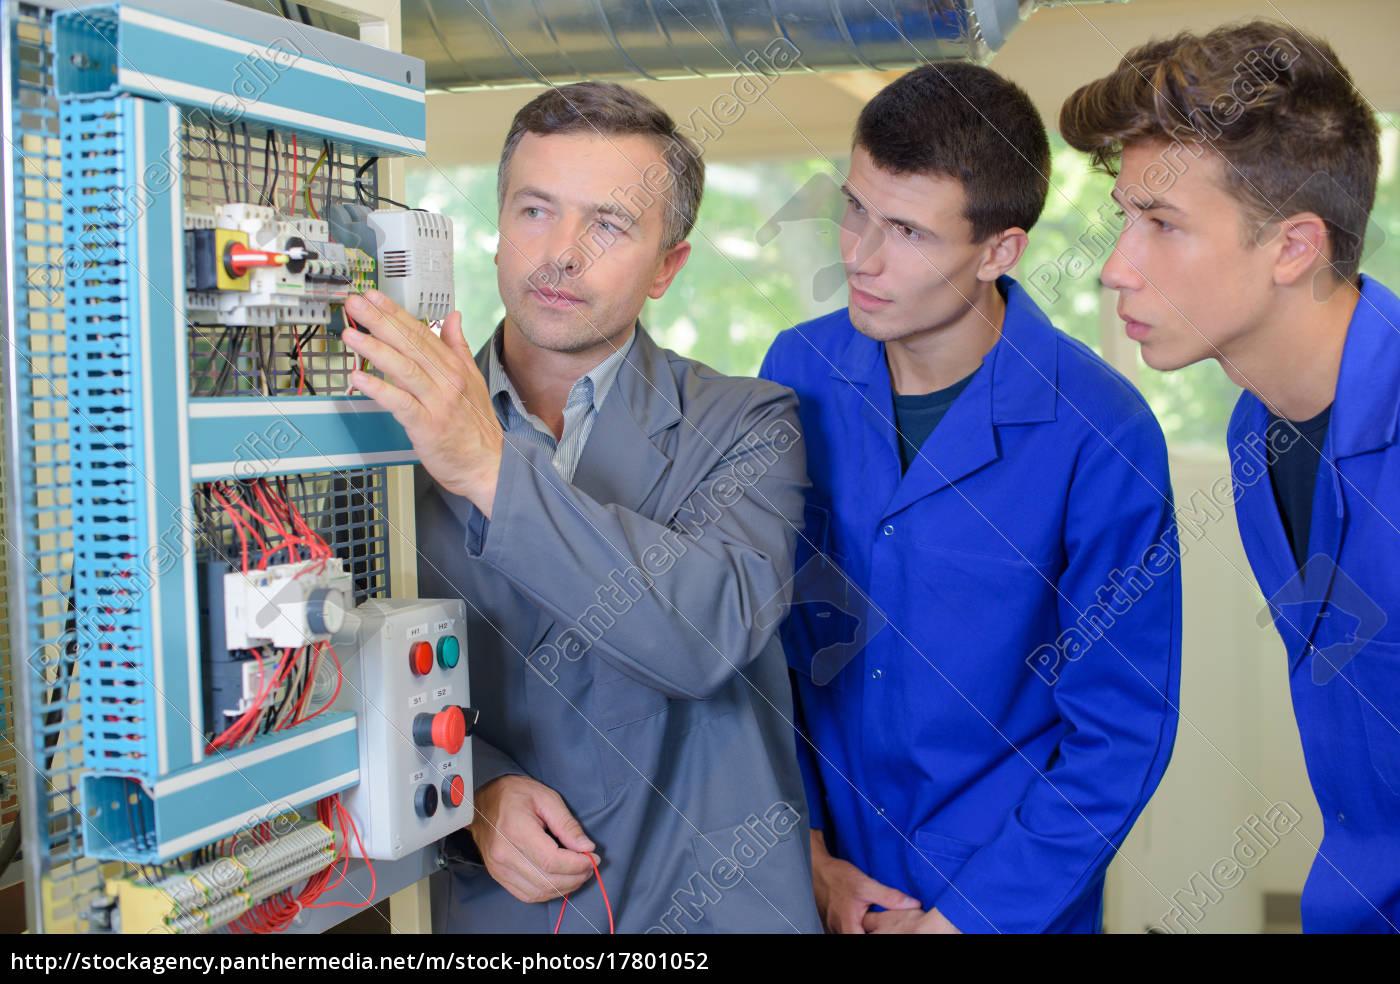 aprendizes, elétricos - 17801052